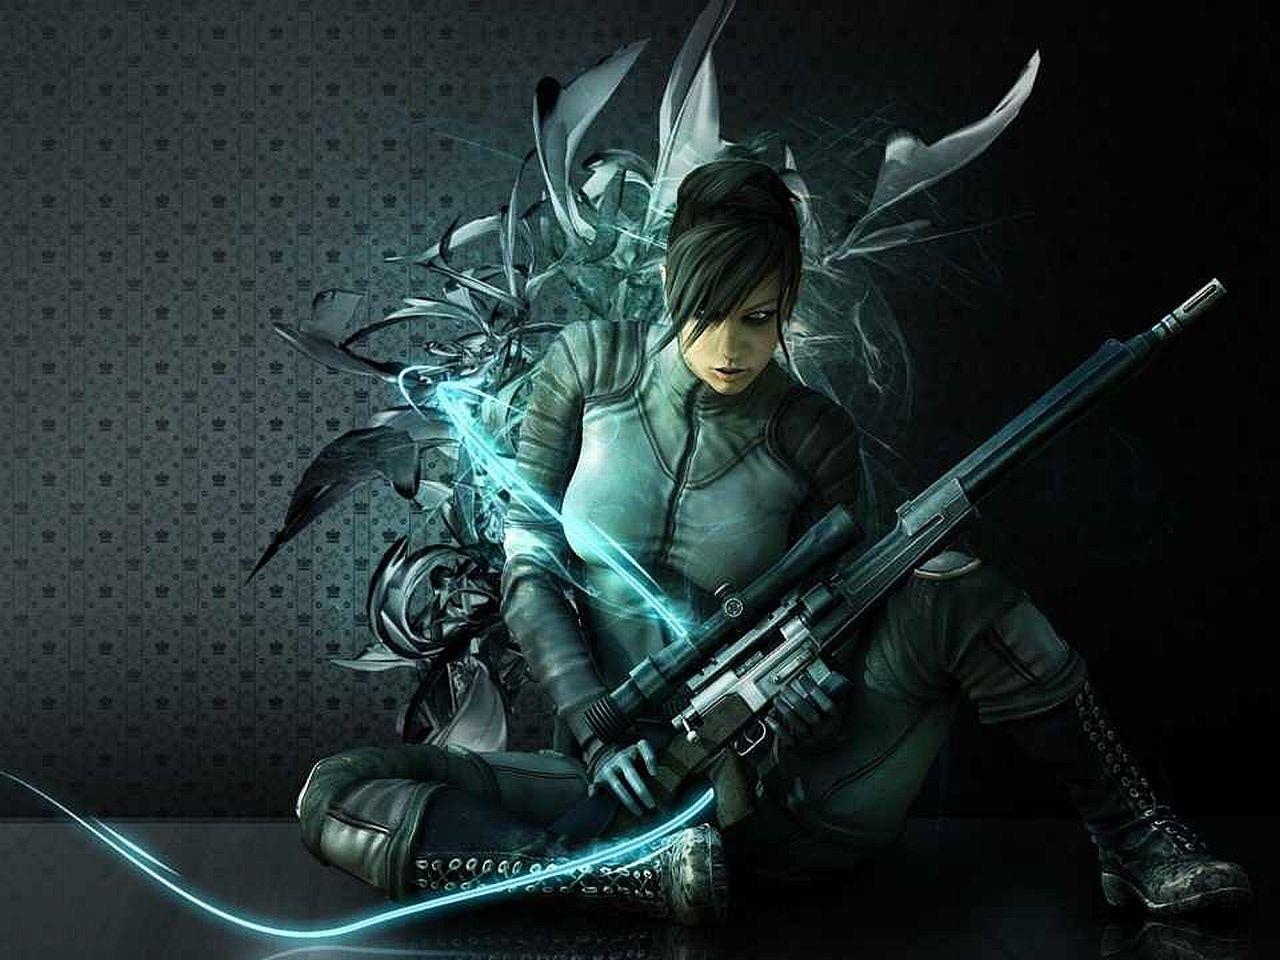 Download 1280x960 Fantasy Women Warrior Wallpaper